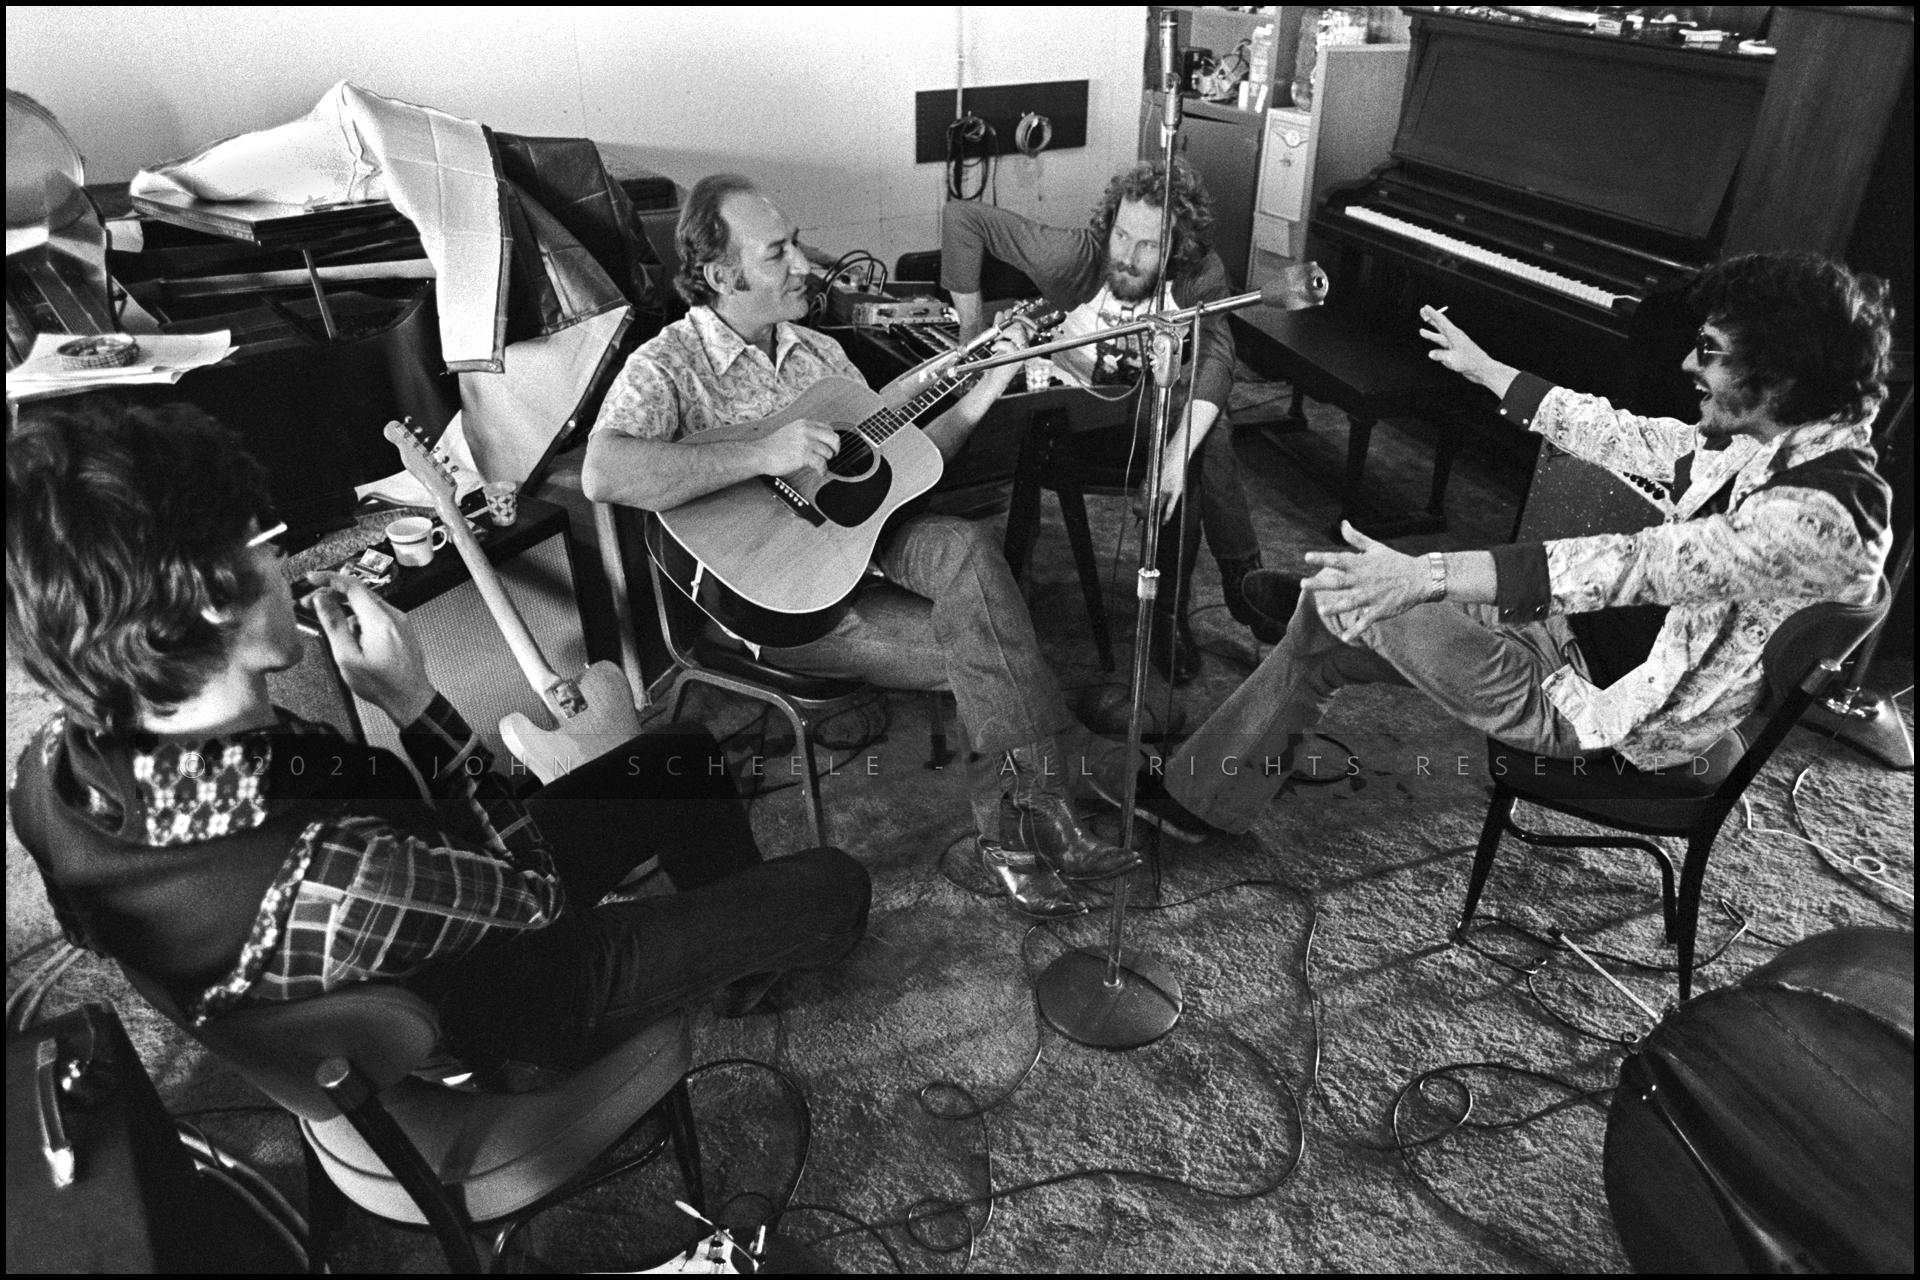 Robbie Robertson, Fred Carter, Jr, Levon Helm, Rick Danko Shangri-la Studio, Malibu (1975)